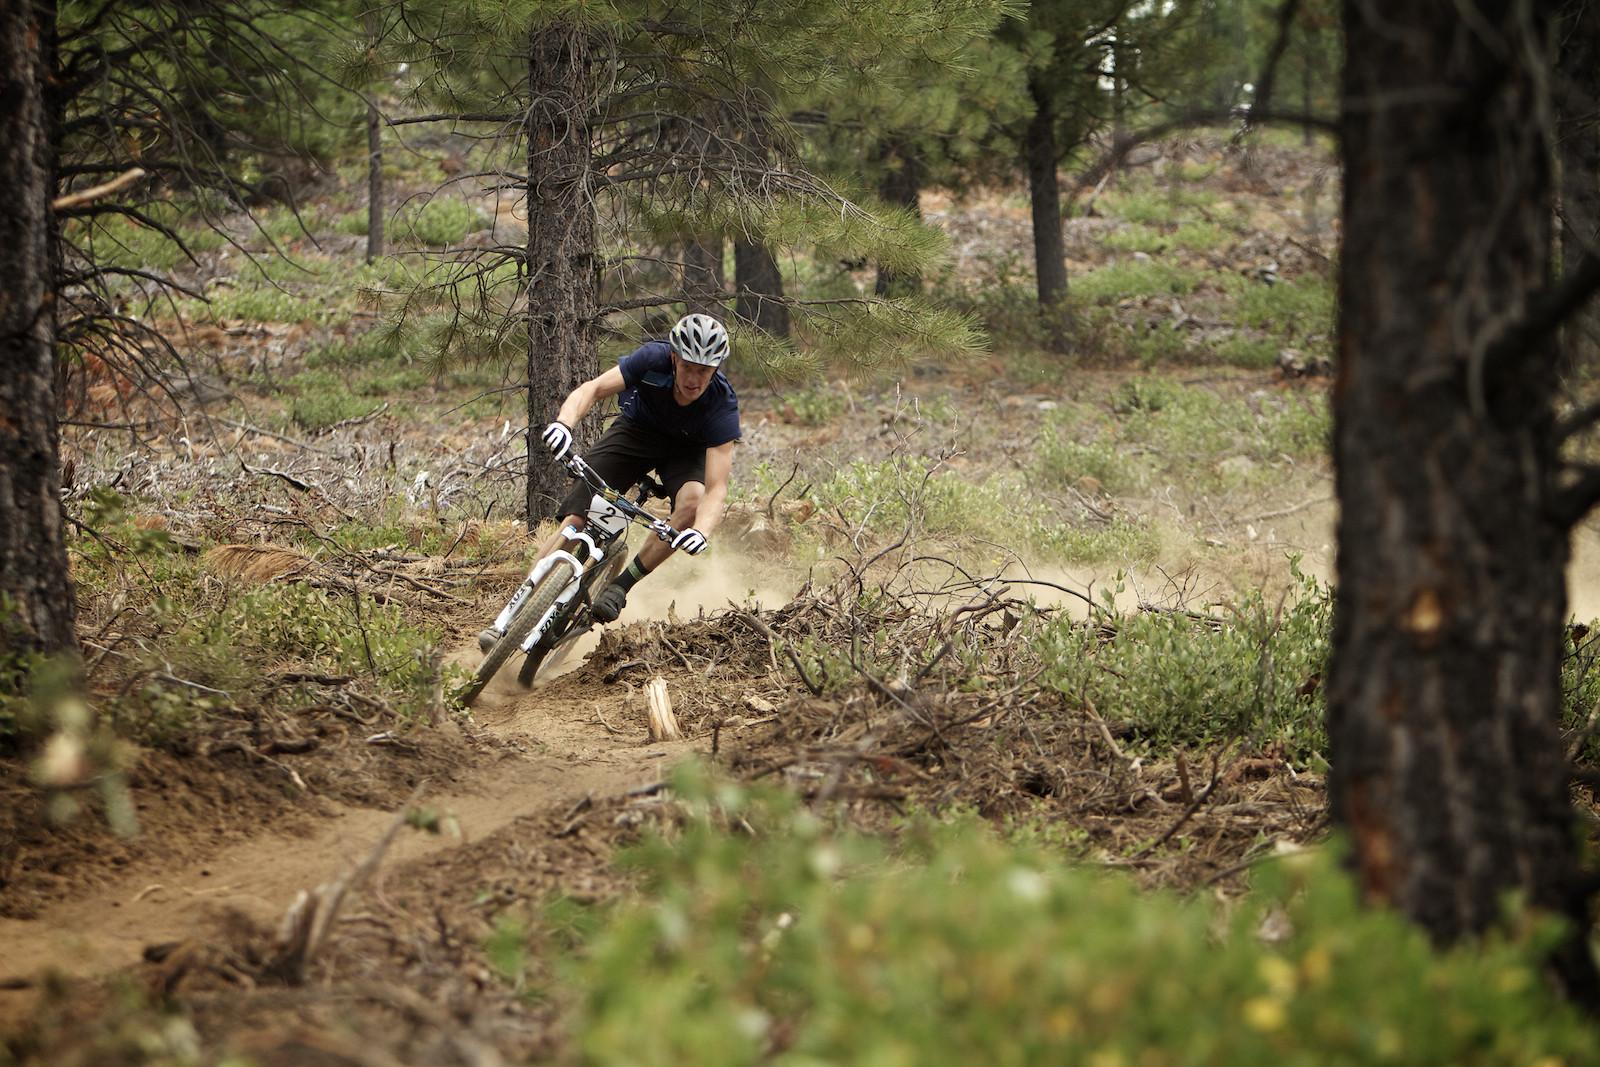 2012 Sisters Enduro Chris Johnston - corytepper.com - Mountain Biking Pictures - Vital MTB